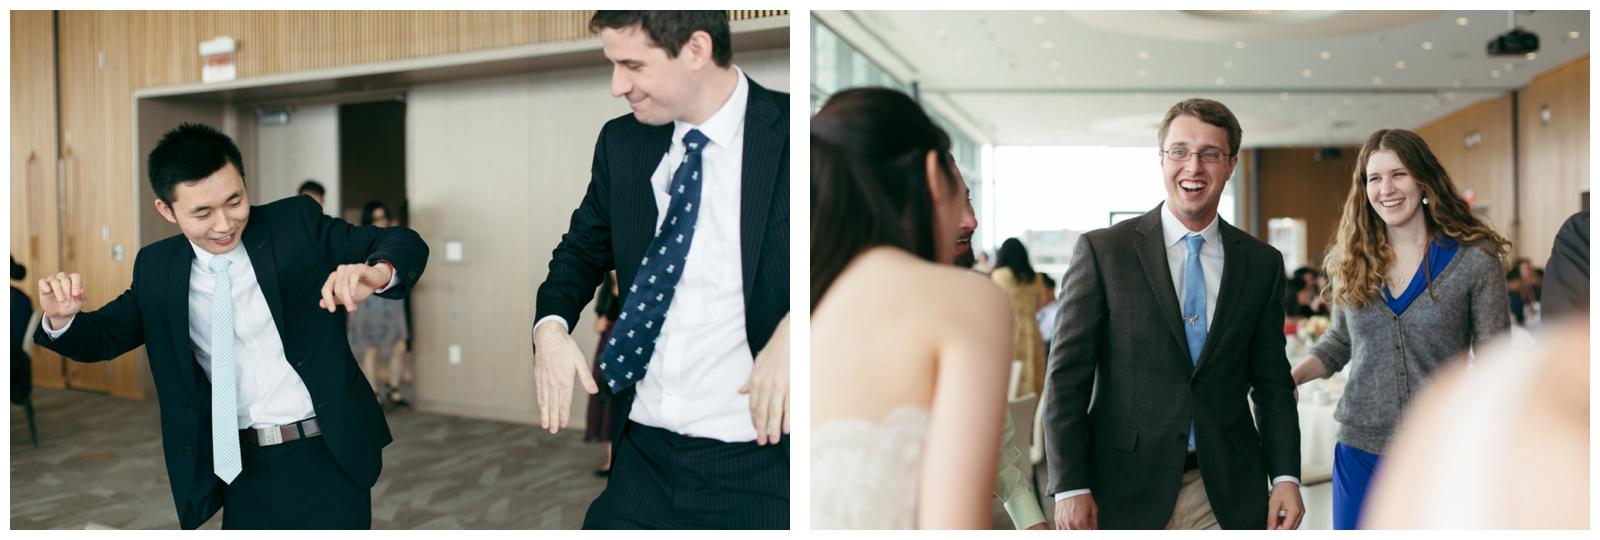 Samberg-Conference-Center-Boston-Wedding-Photographer-Bailey-Q-Photo-120.jpg